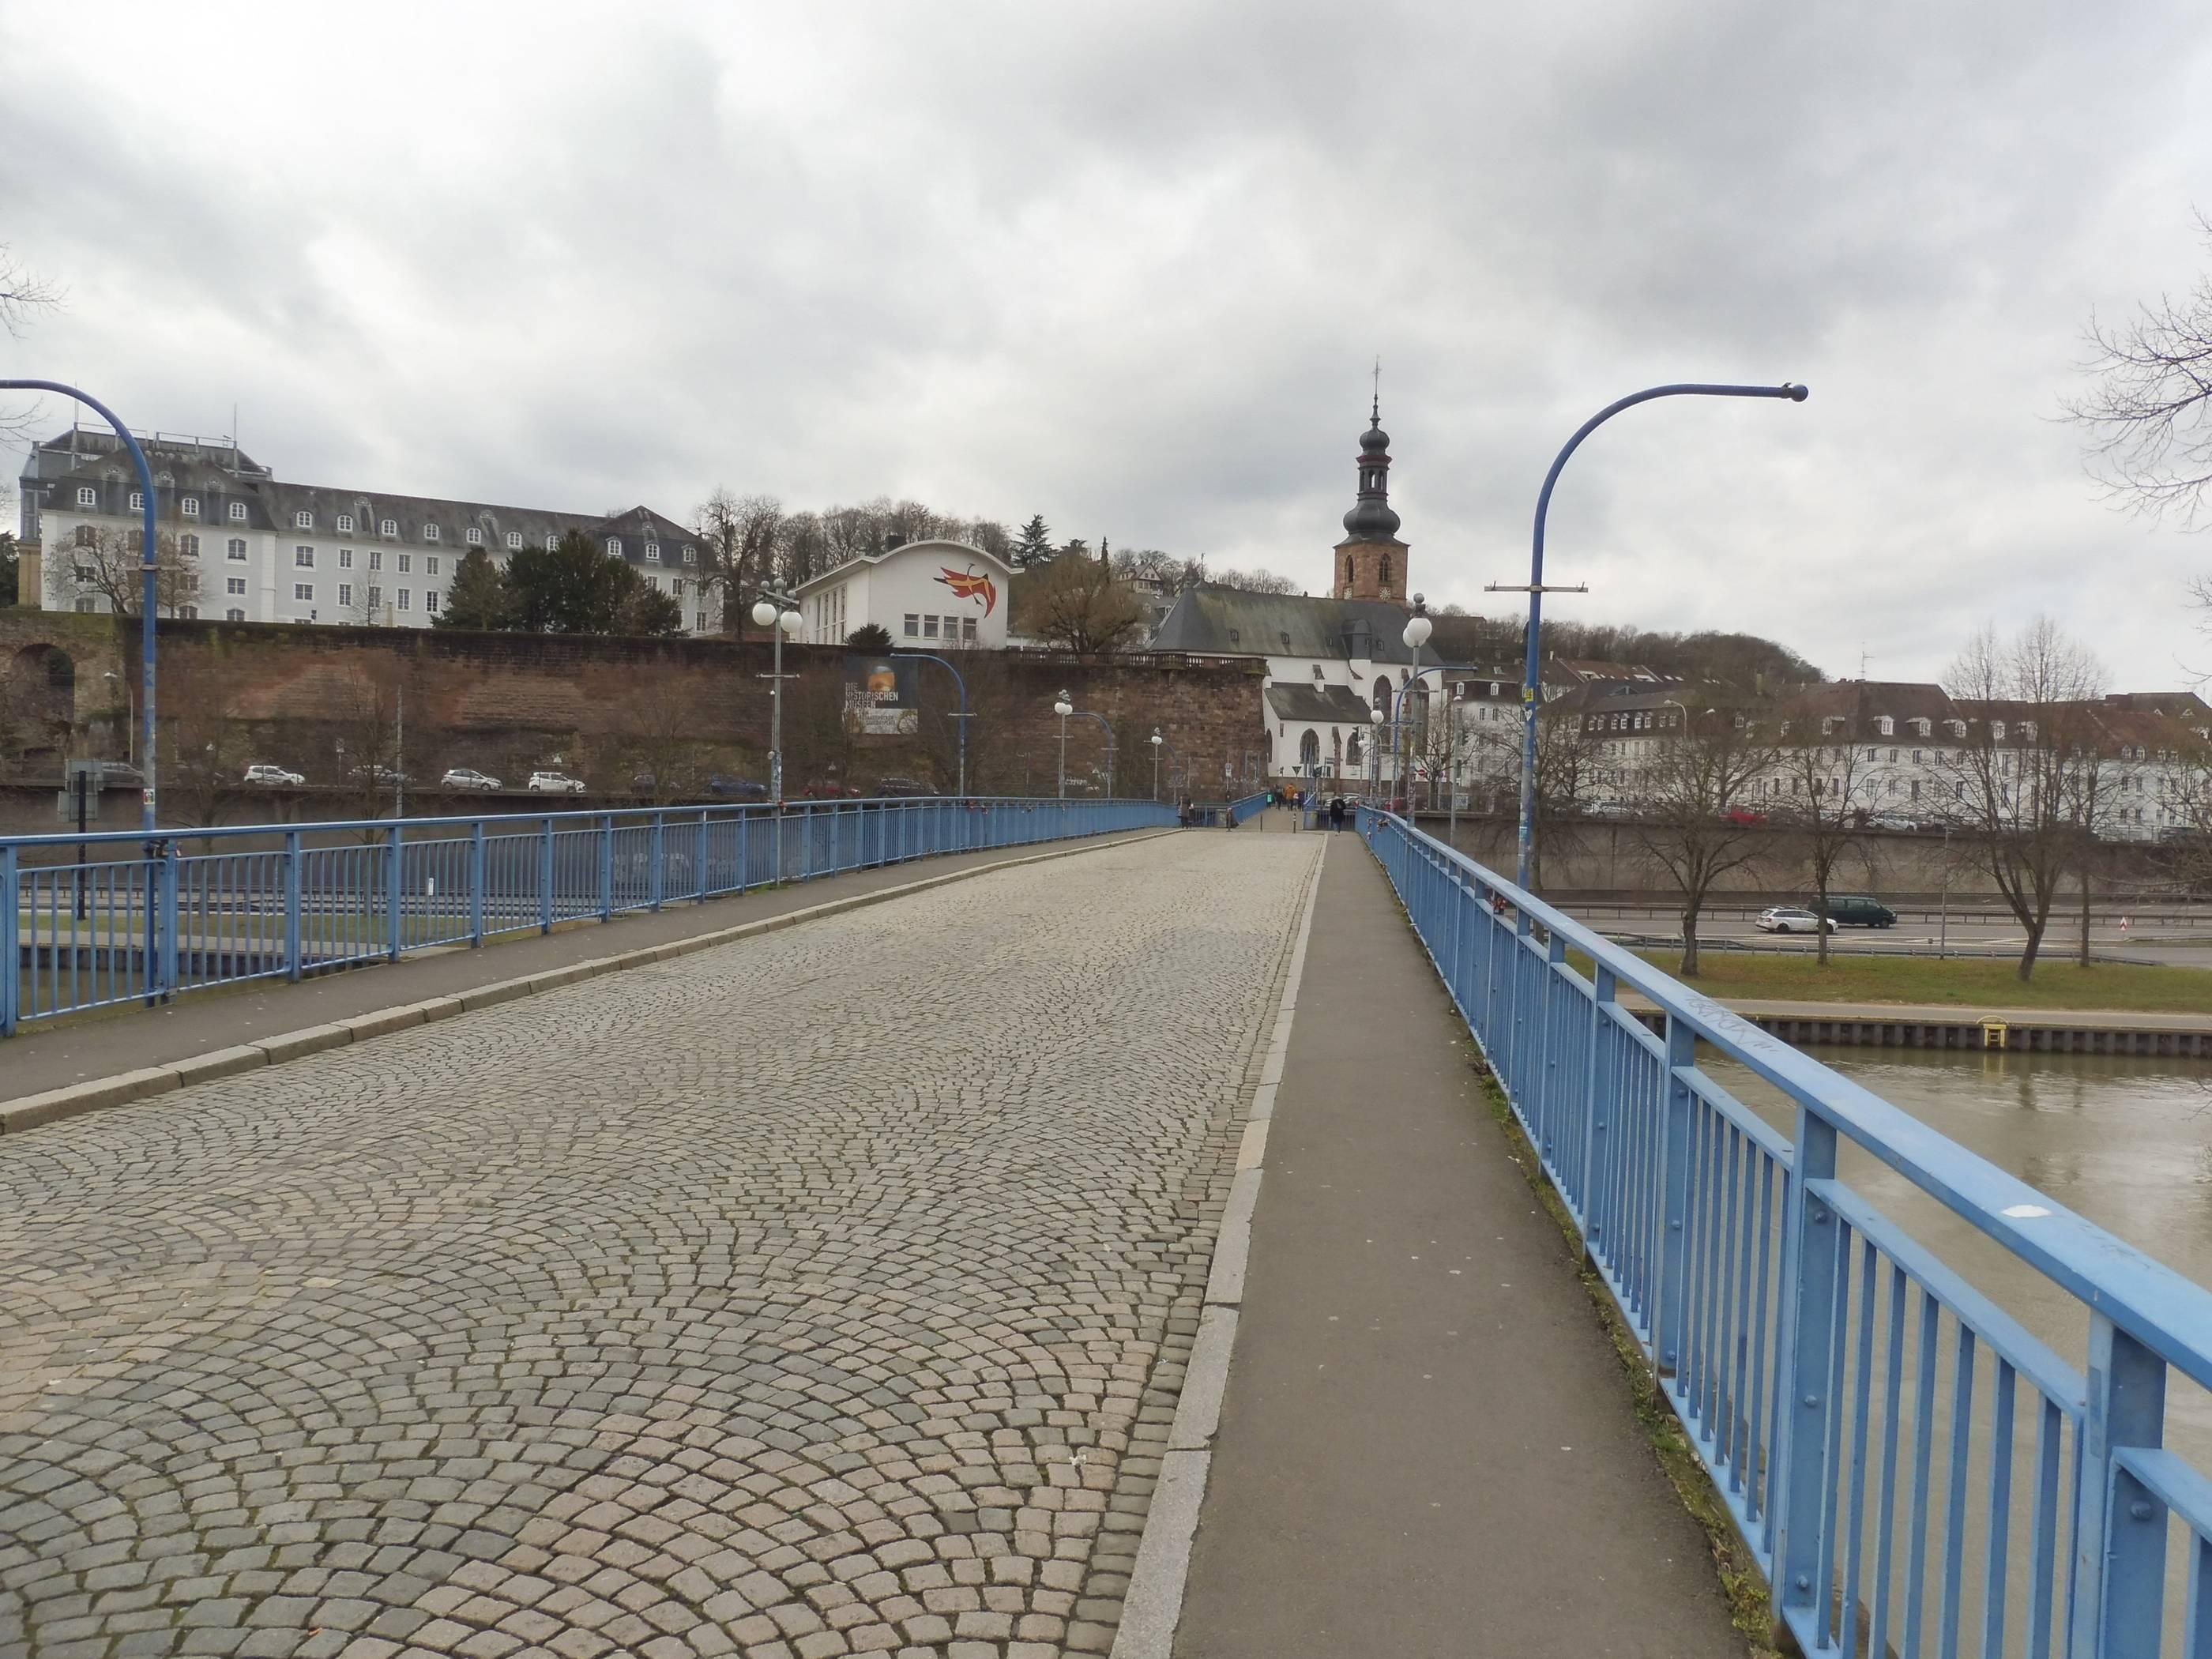 Petersdorfer Brücke Heute